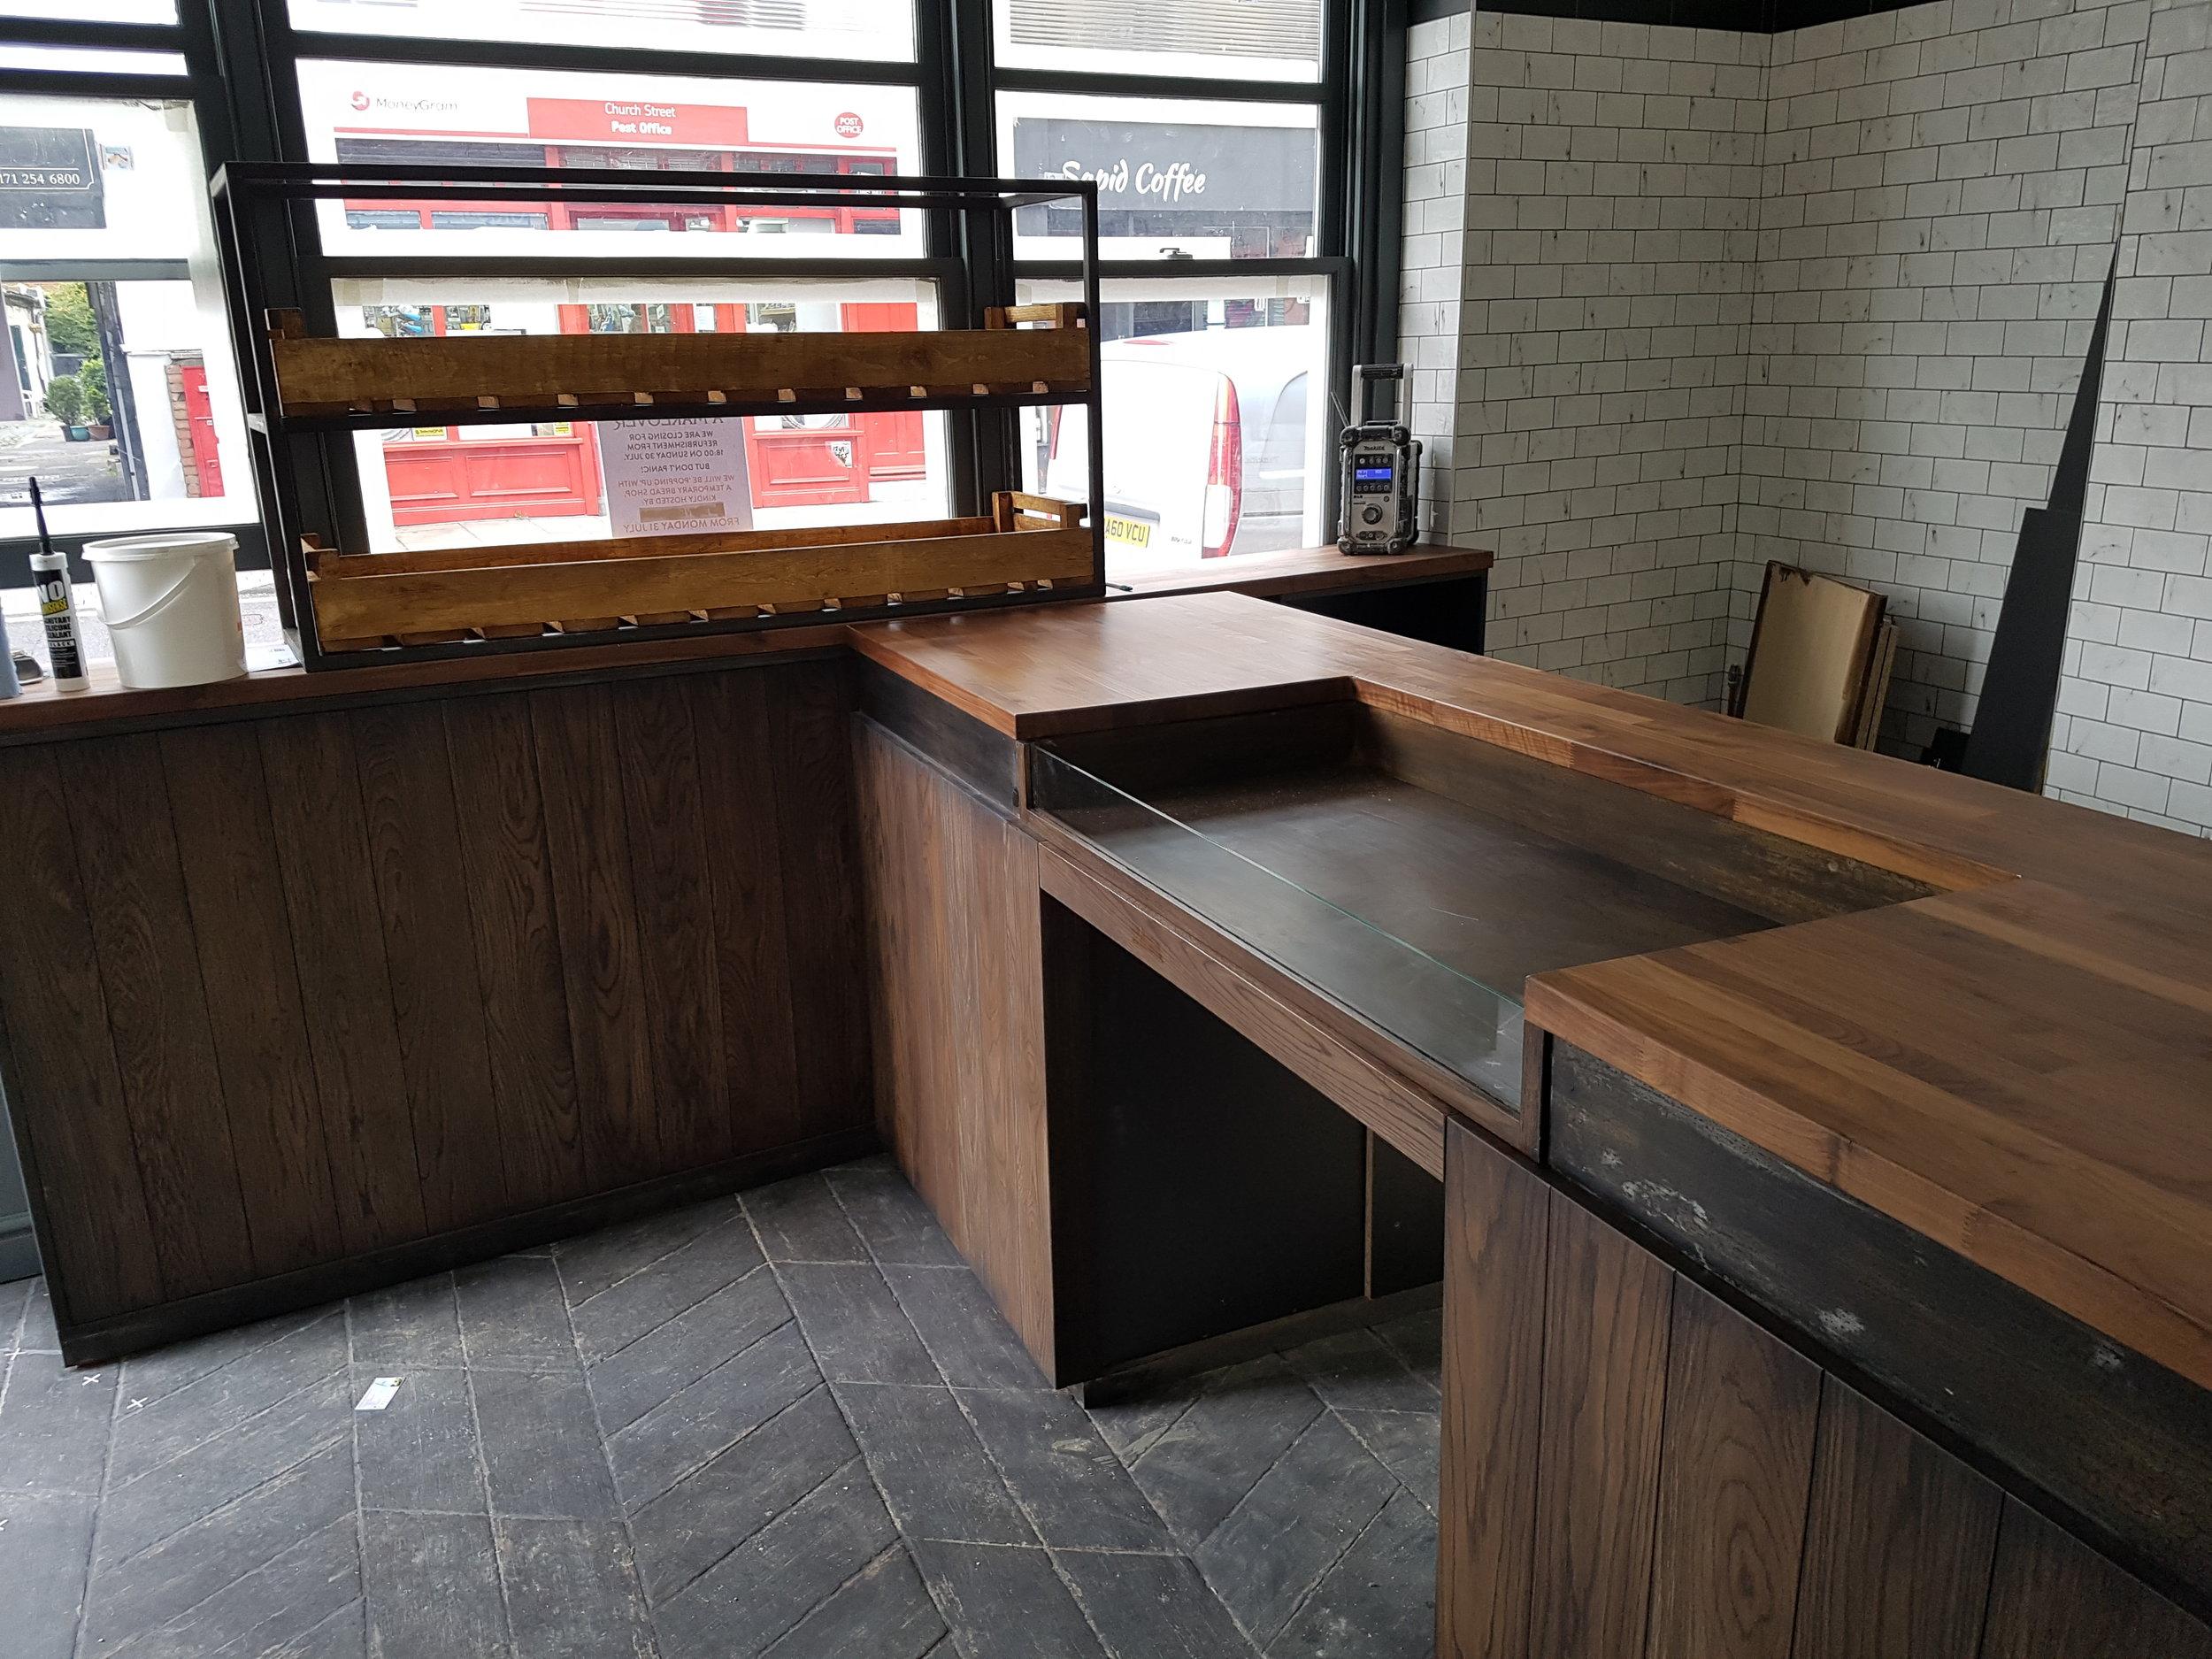 Bakery shop counter.jpg